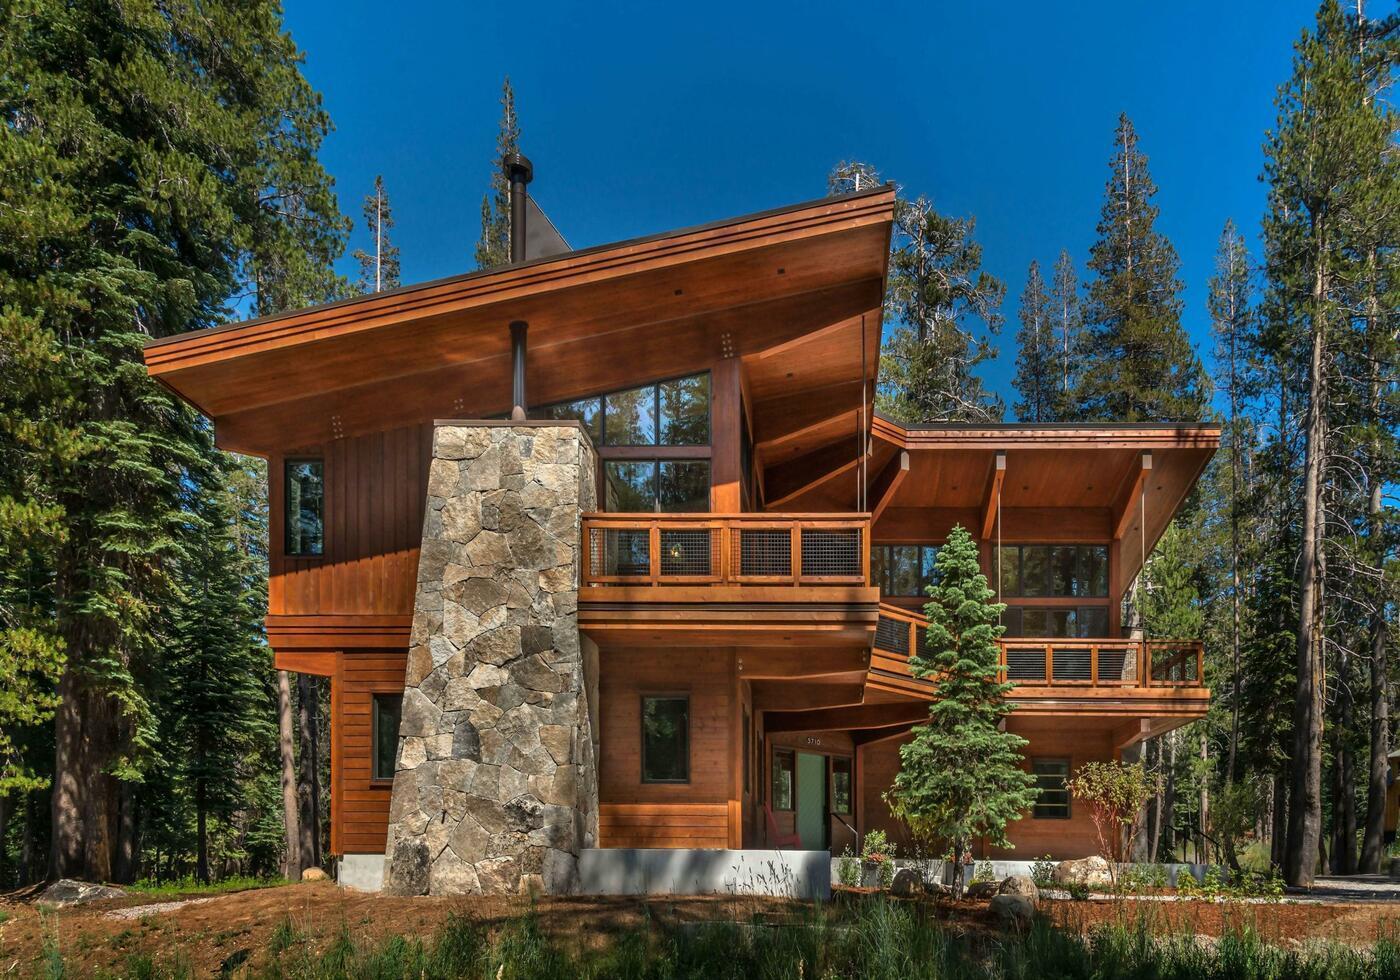 Mountain wood cabin design